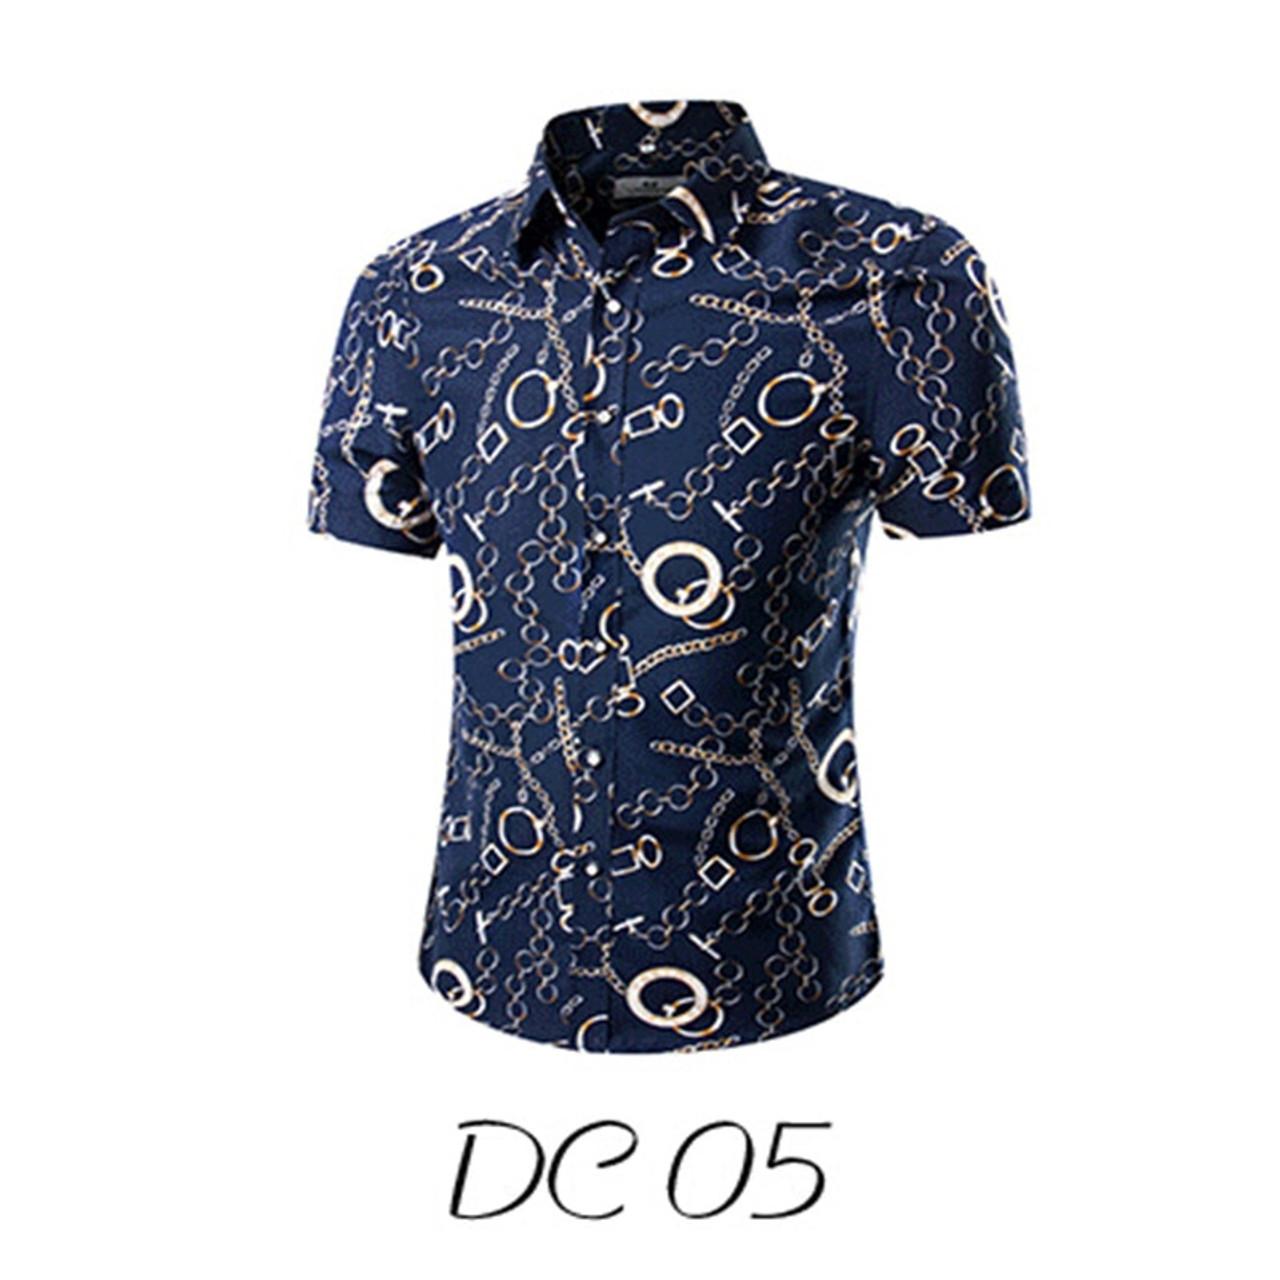 37a9cbc1a ... 2018 Fashion Mens Short Sleeve Hawaiian Shirt Summer Casual Floral  Shirts For Men Asian Size M ...